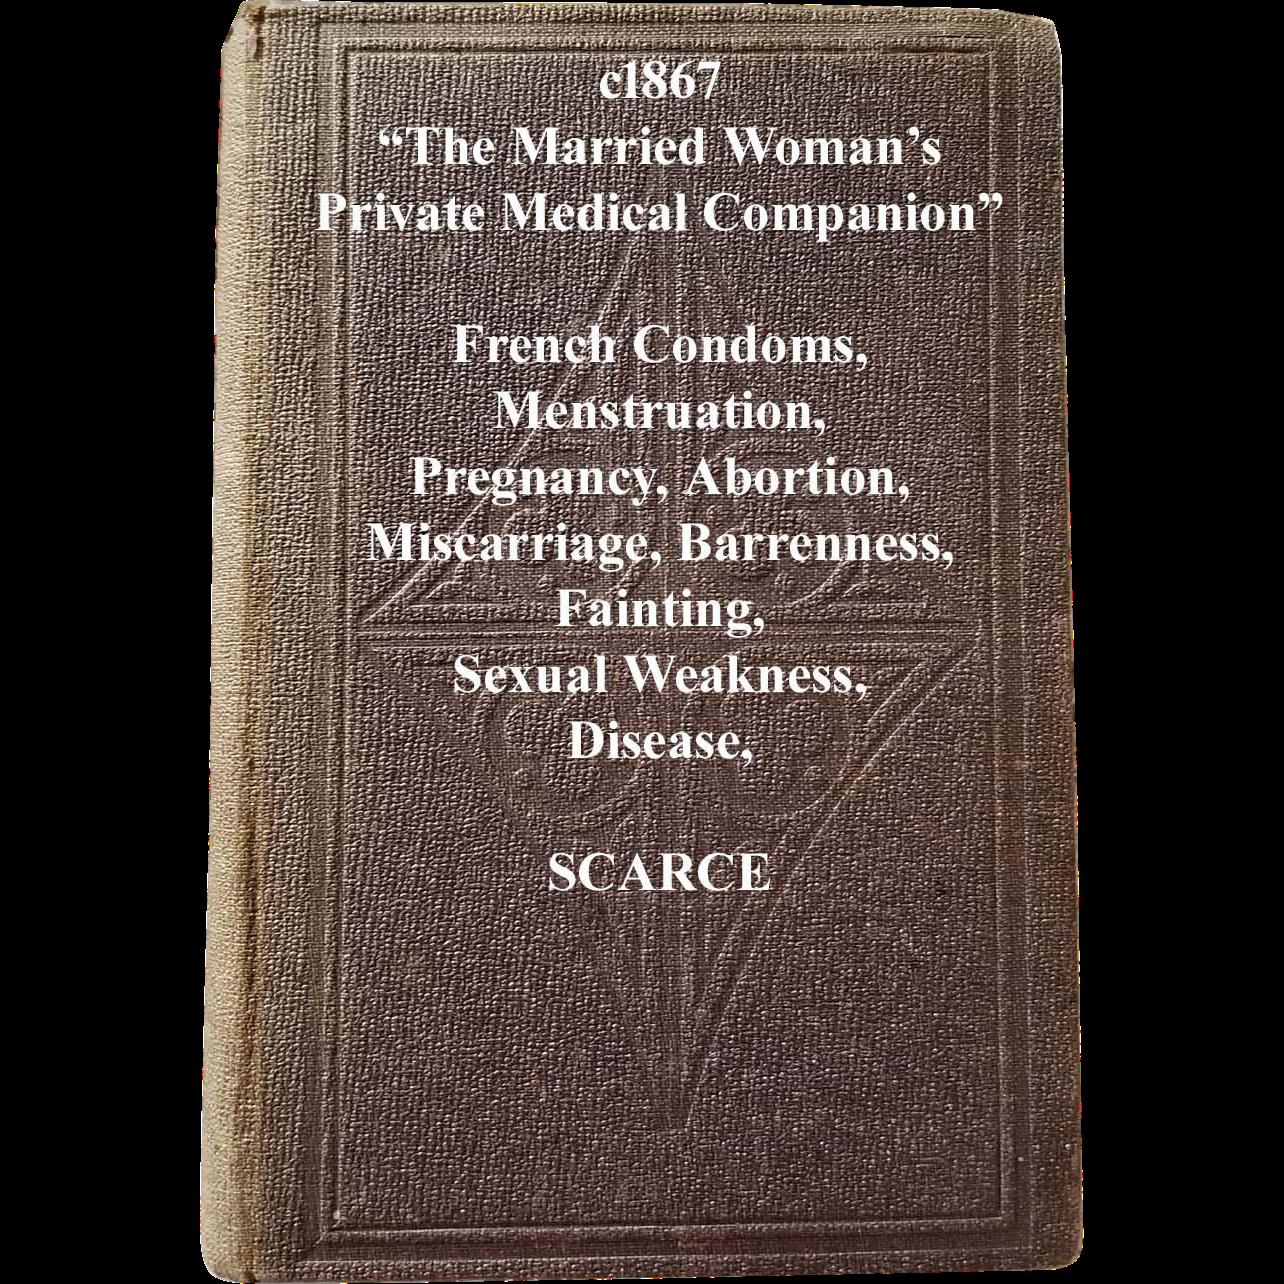 c1867 Married Womans Private Medical Companion Book Civil War Medicine Condom Pregnancy Abortion Birth Barrenness Sterility Midwife